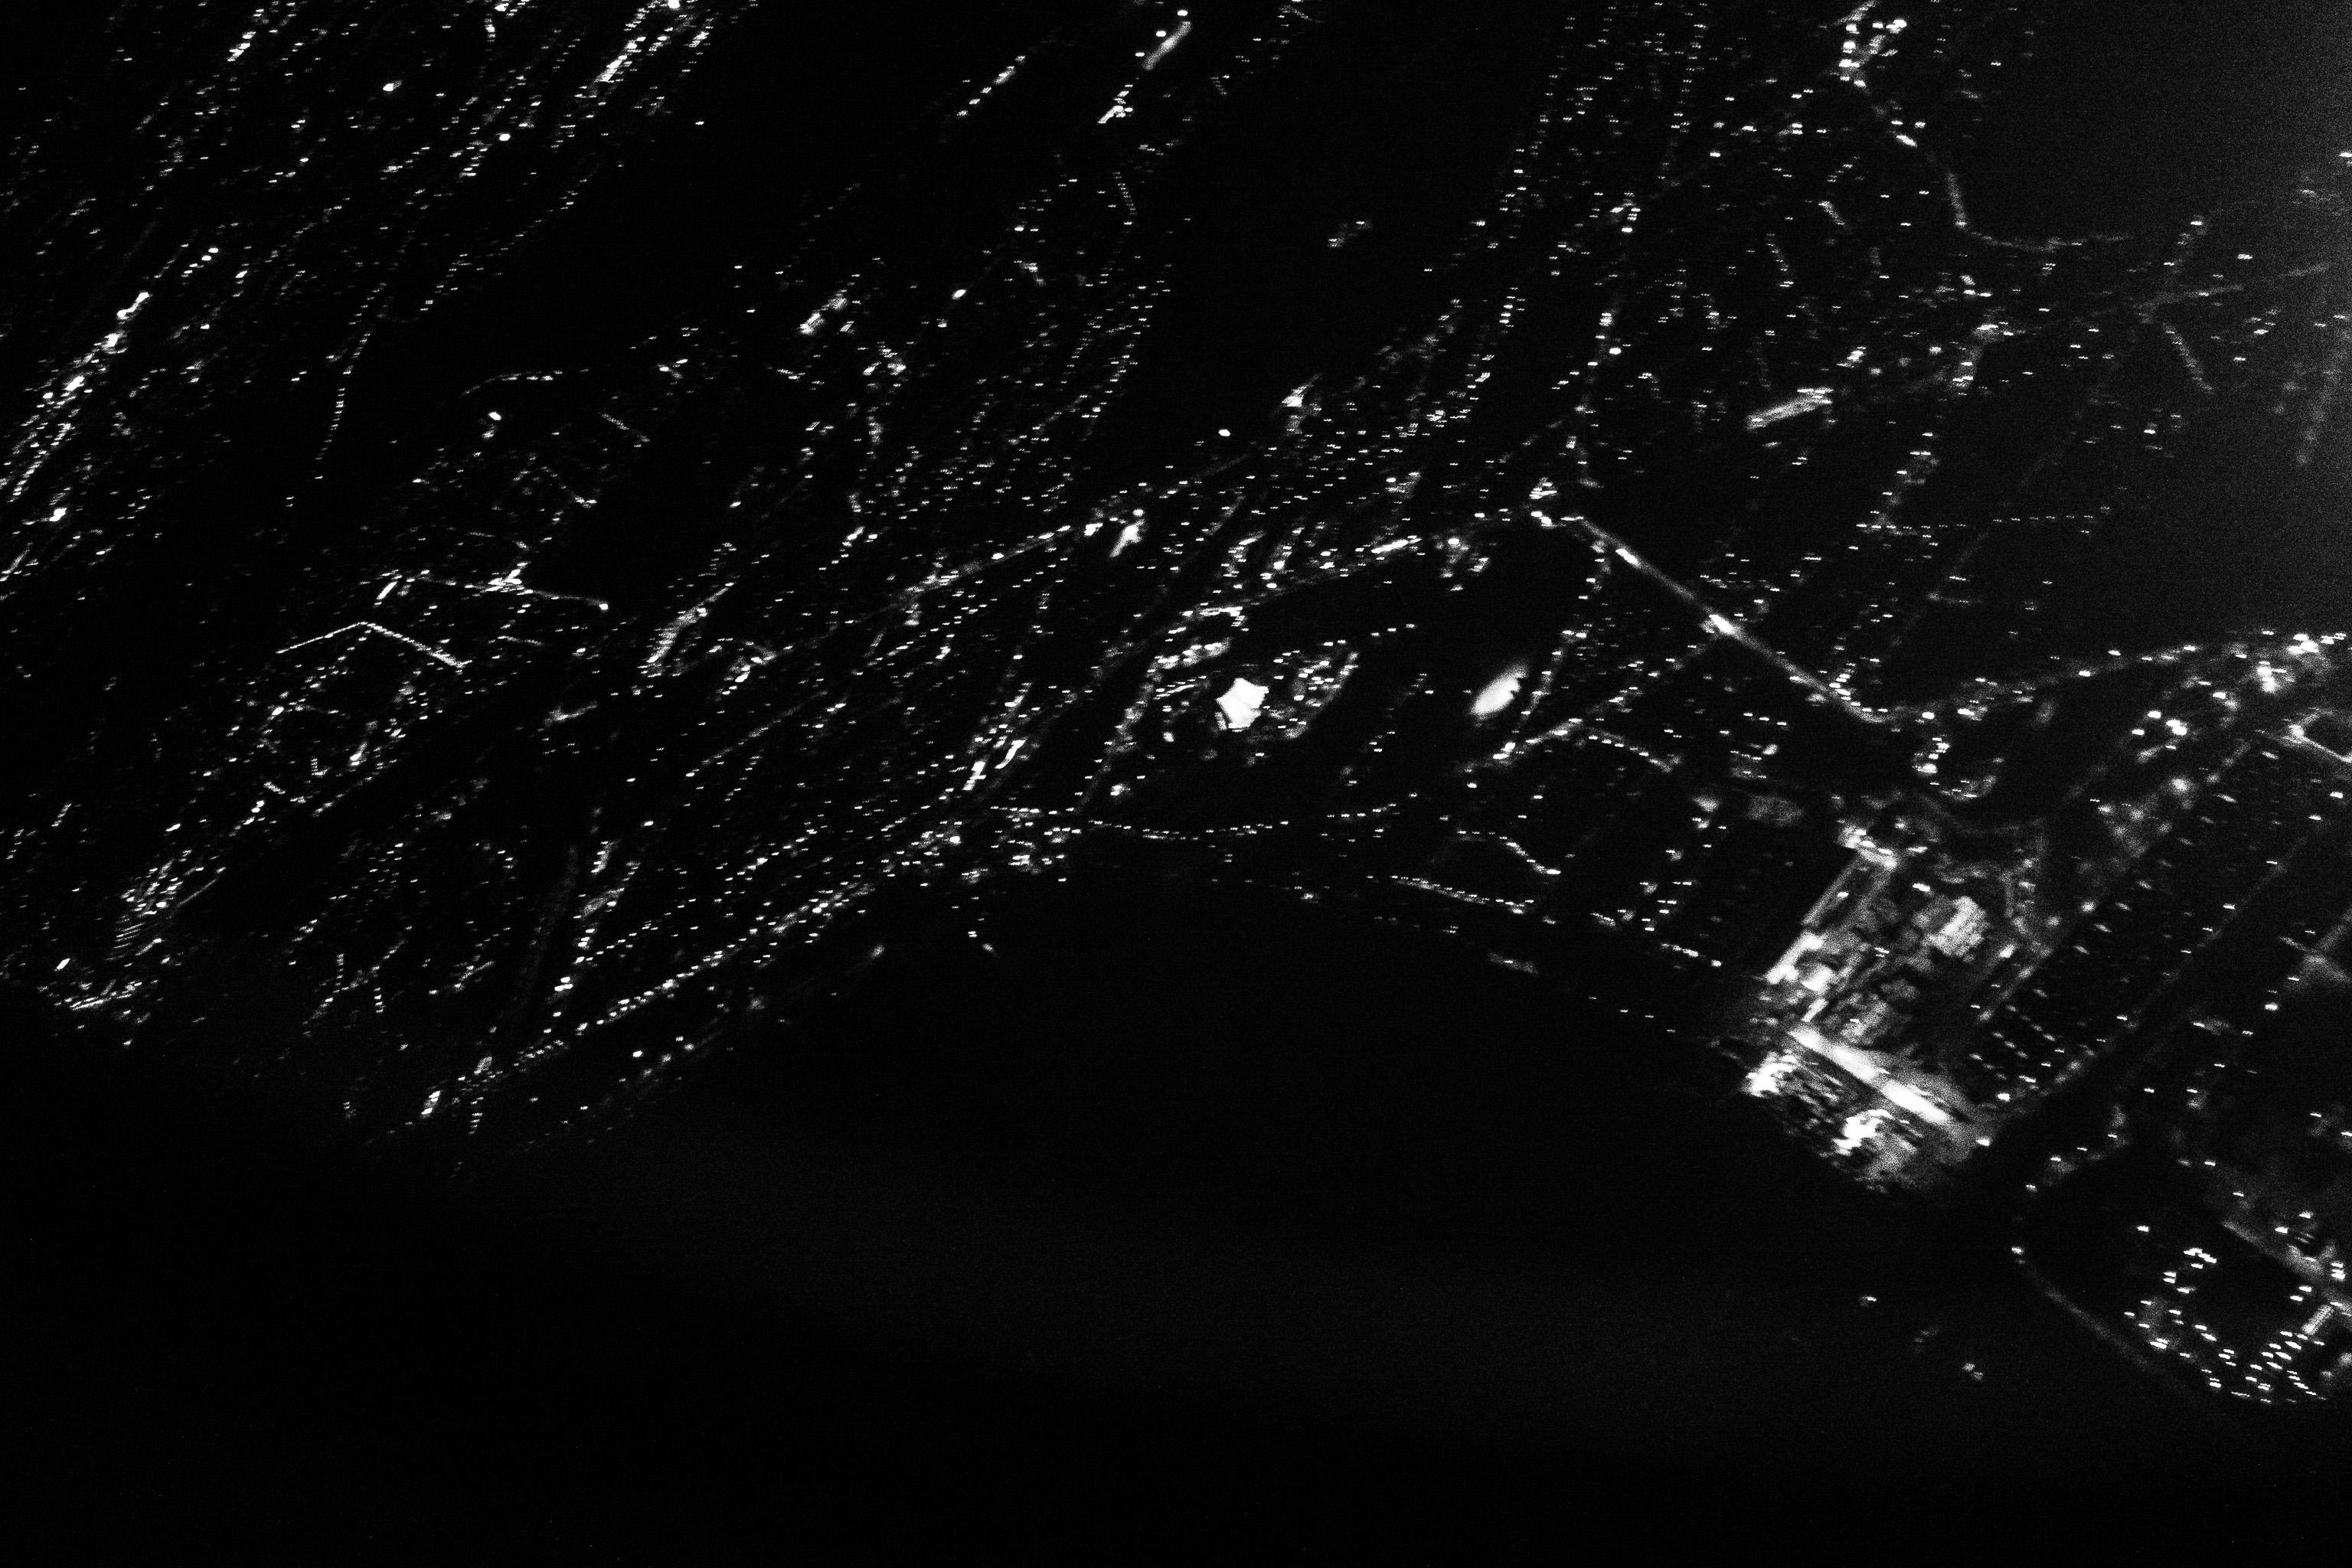 Vol de Nuit (12 von 16)